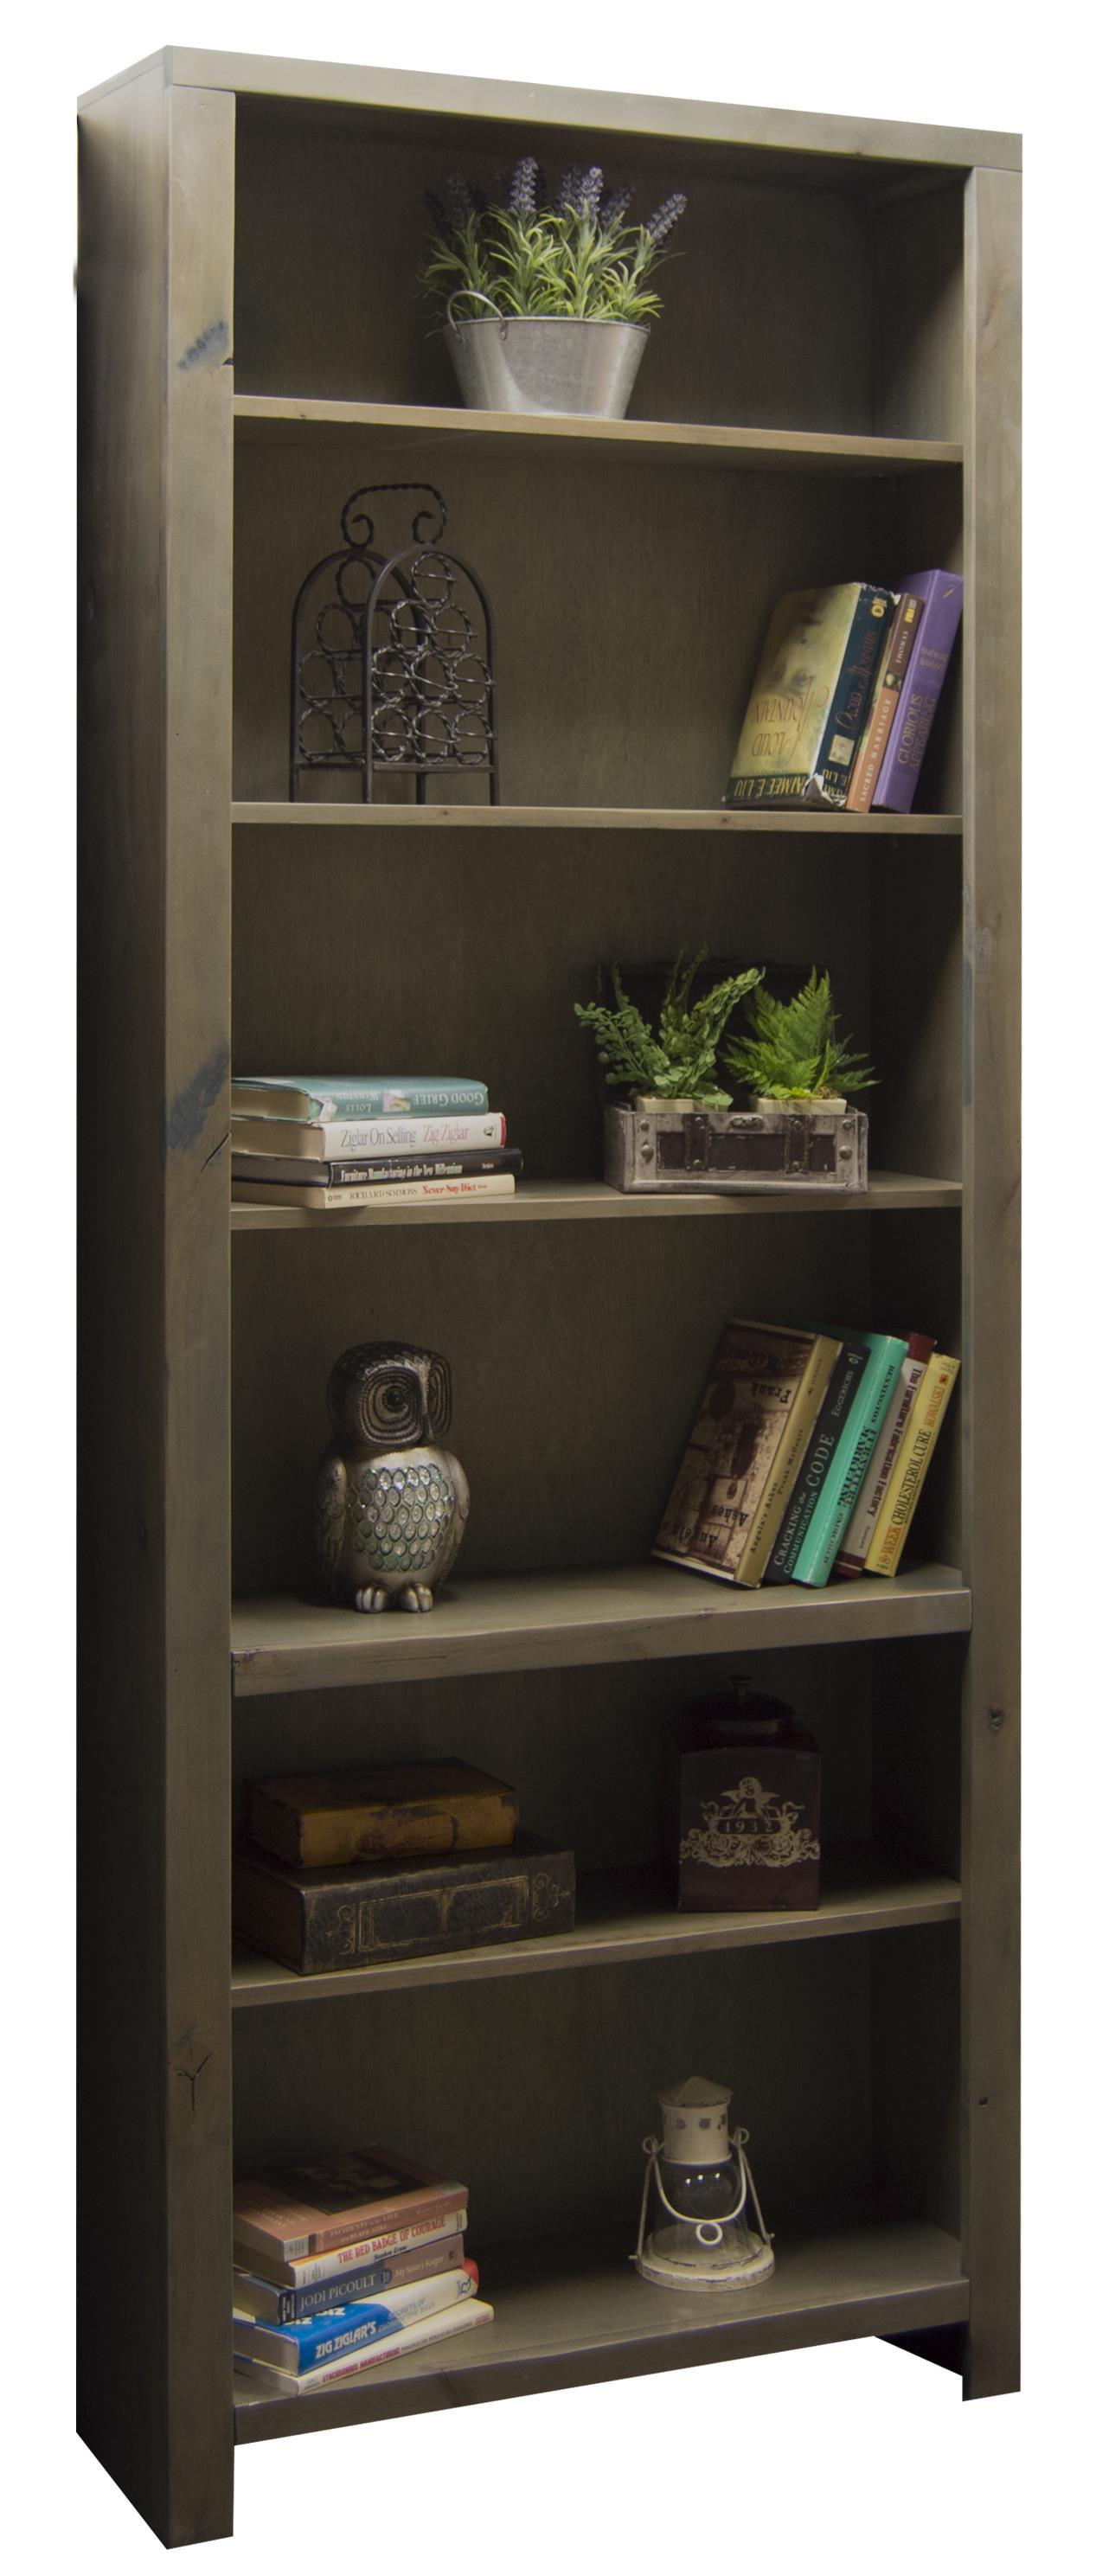 "Legends Furniture Joshua Creek 84"" Bookcase - Item Number: JC6684-BNW"